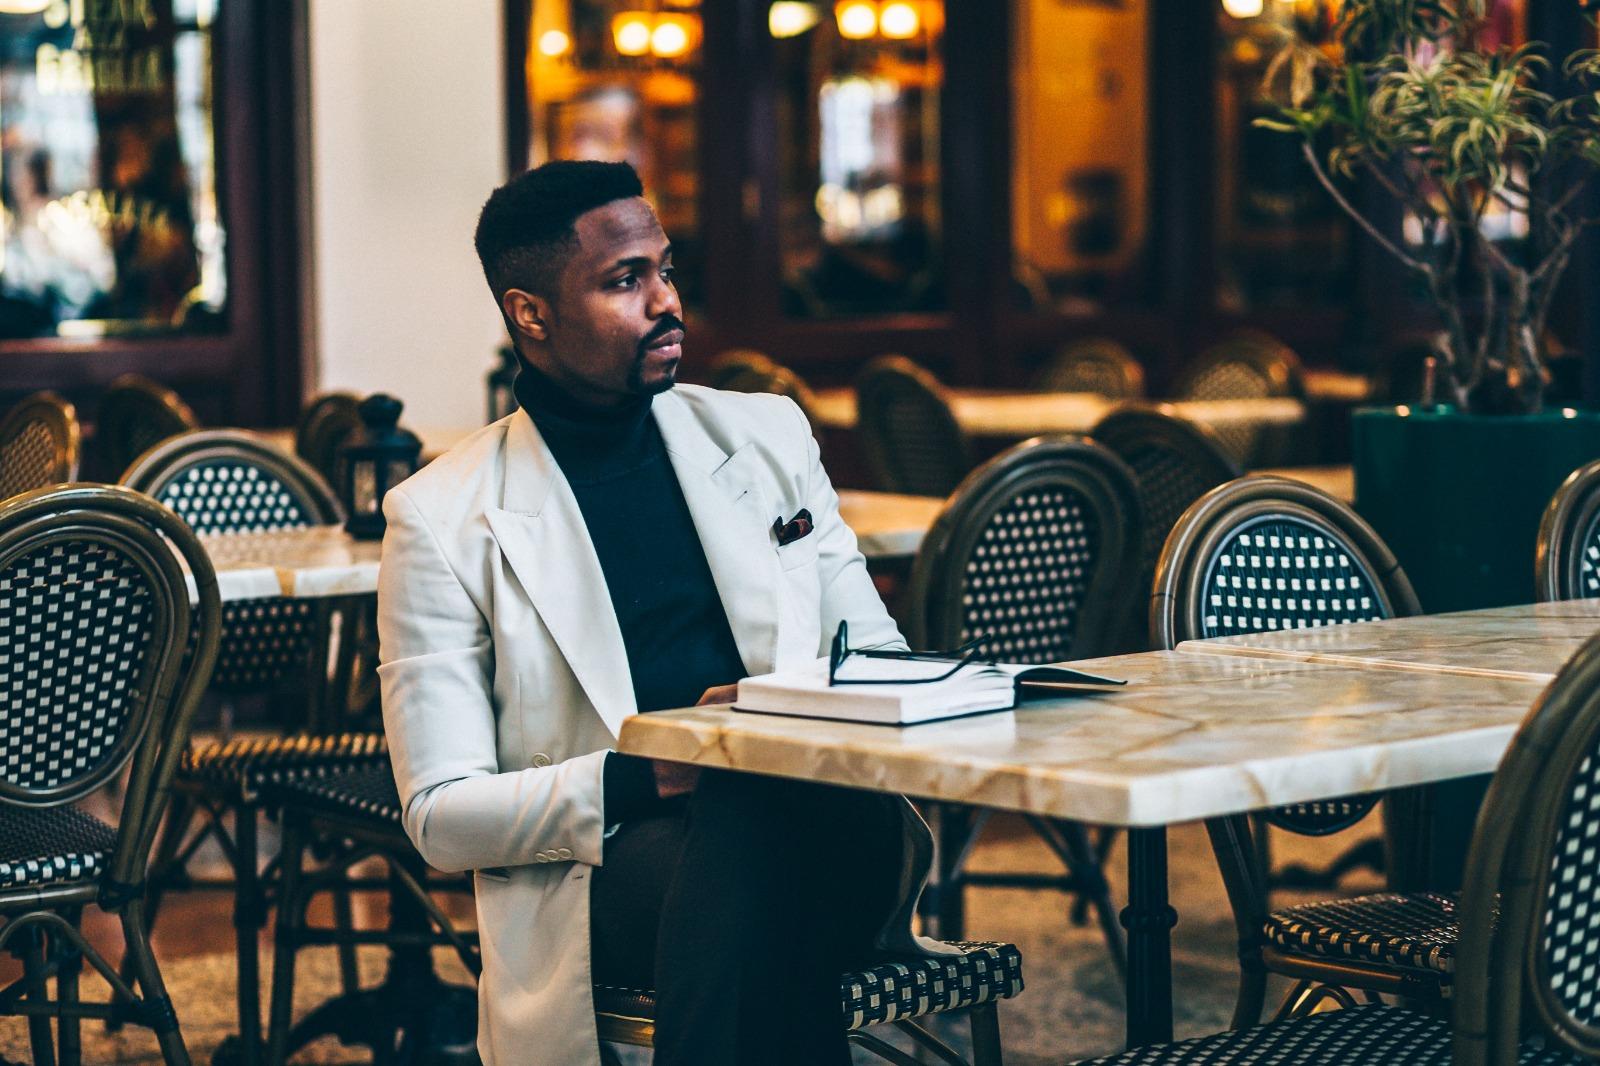 O.O.Kukoyi | The Artful Voice of Neo-African Elegance